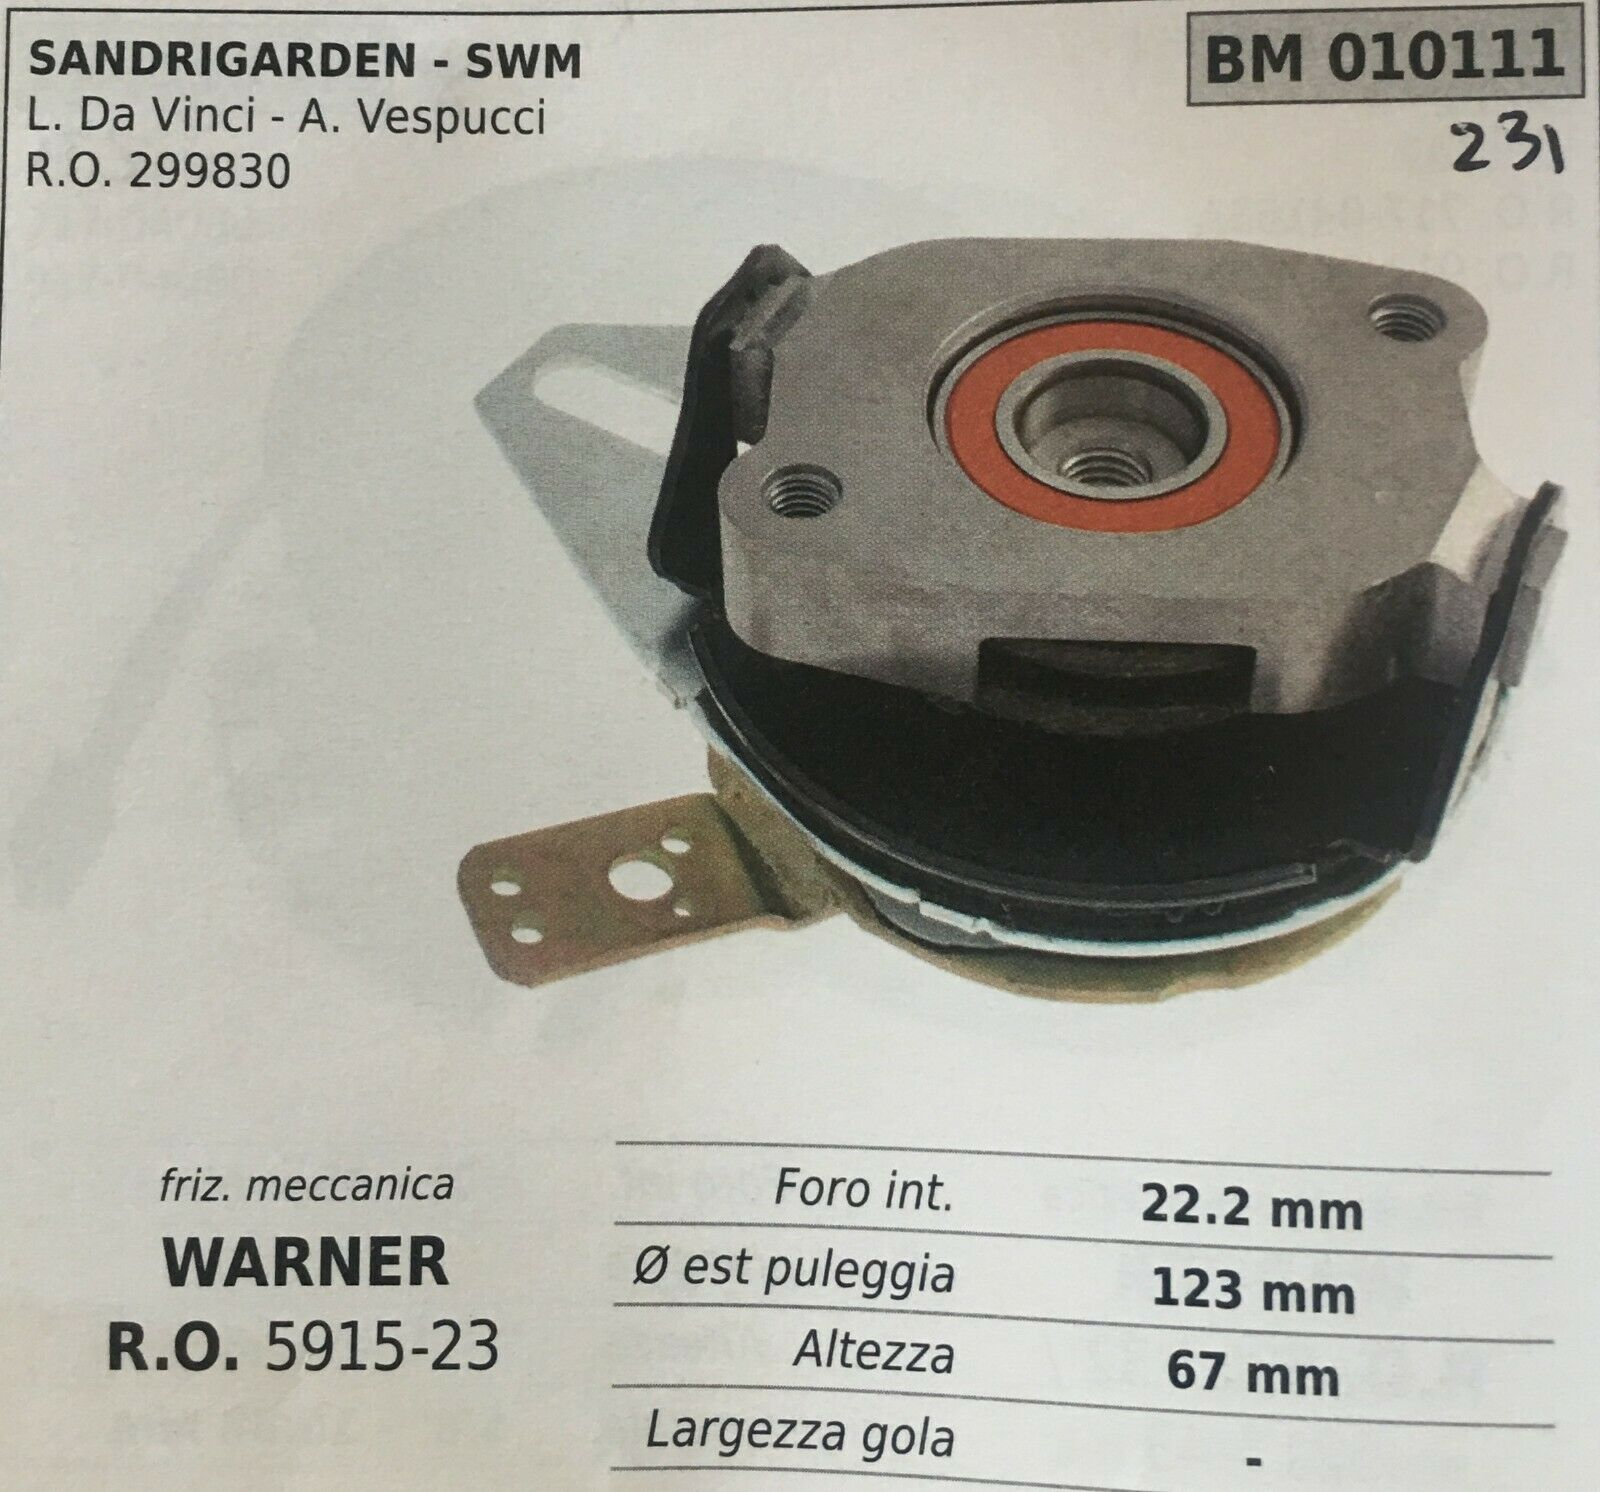 Kupplung Mechanik Brumar BM010111 Montesano - Swm